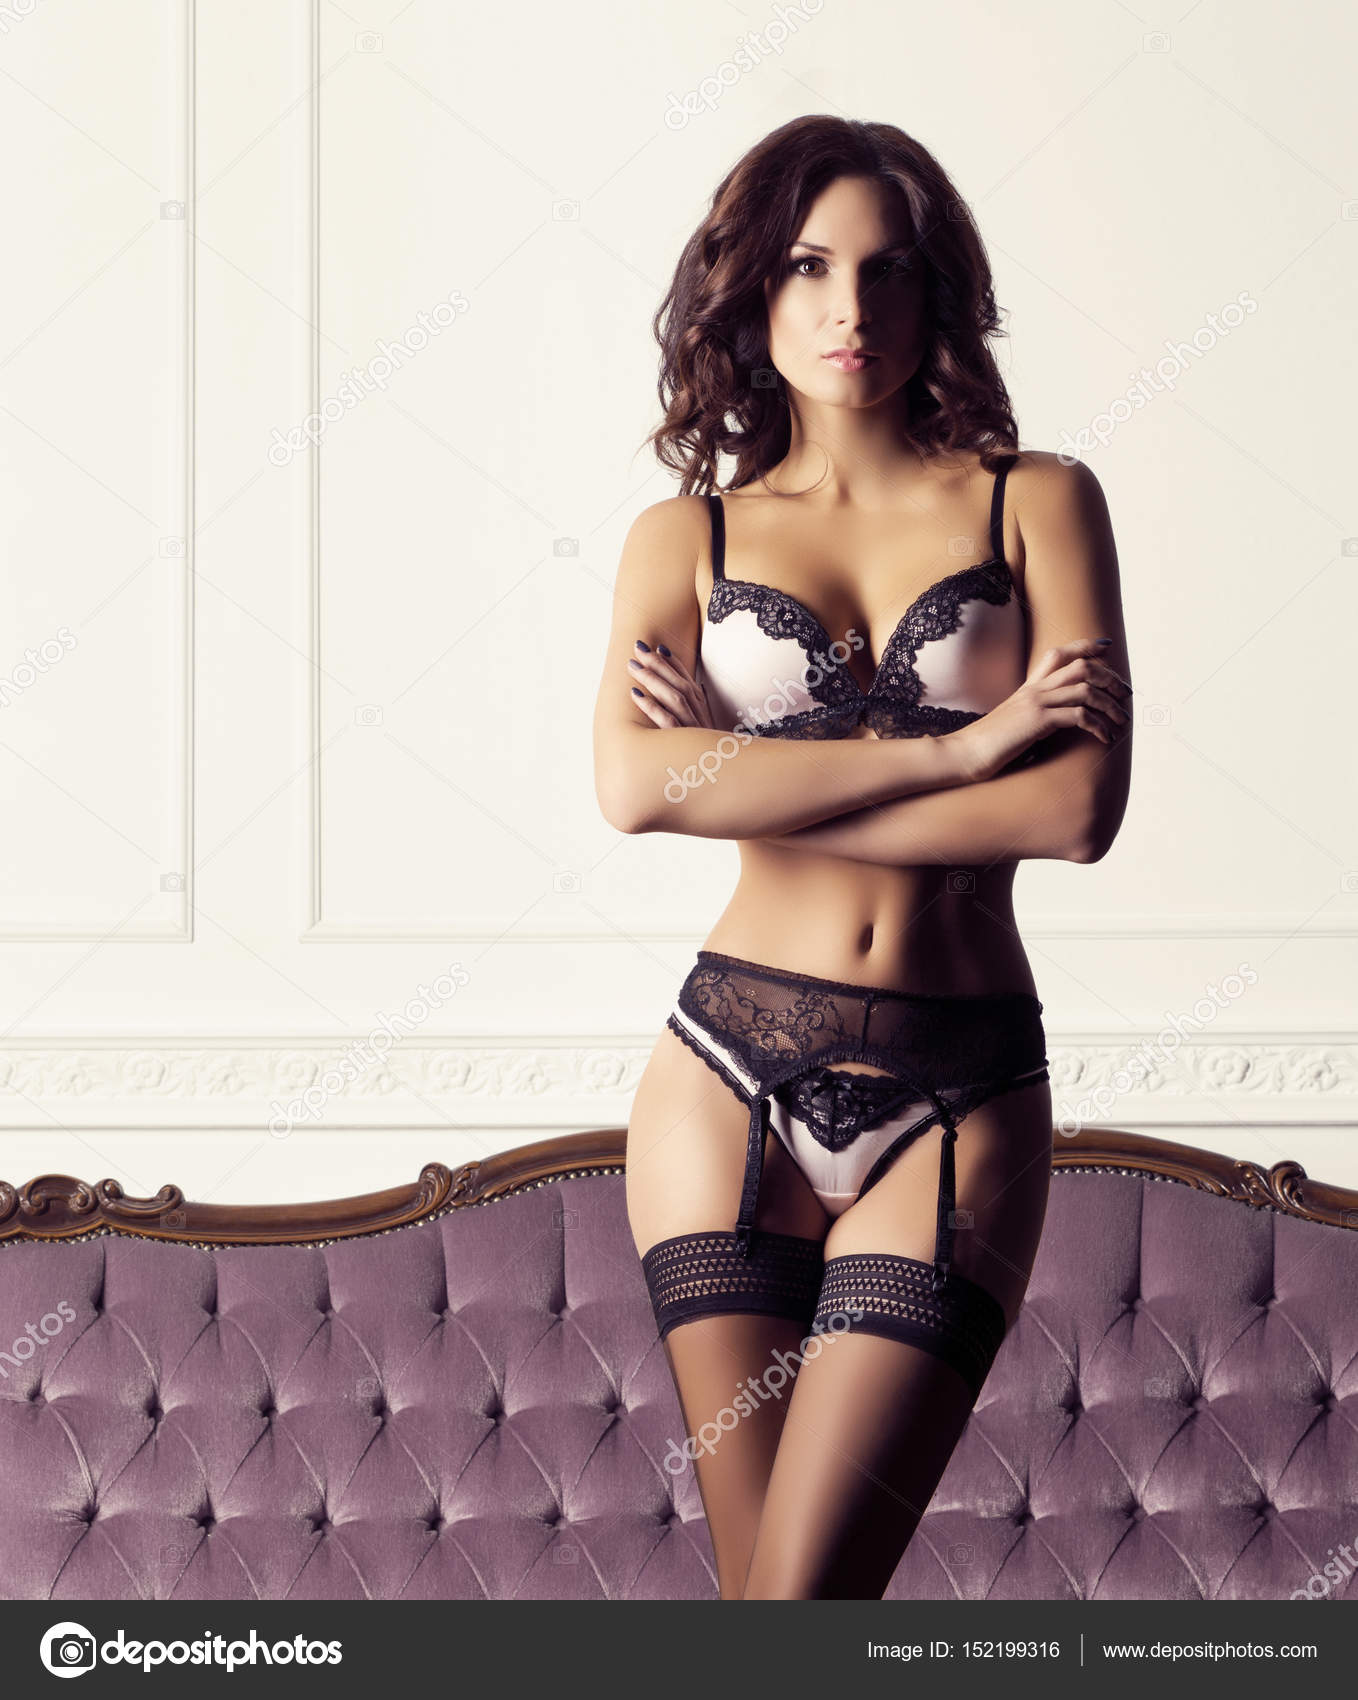 628dc00af Beautiful woman in erotic lingerie posing against magenta retro sofa.  Fashion